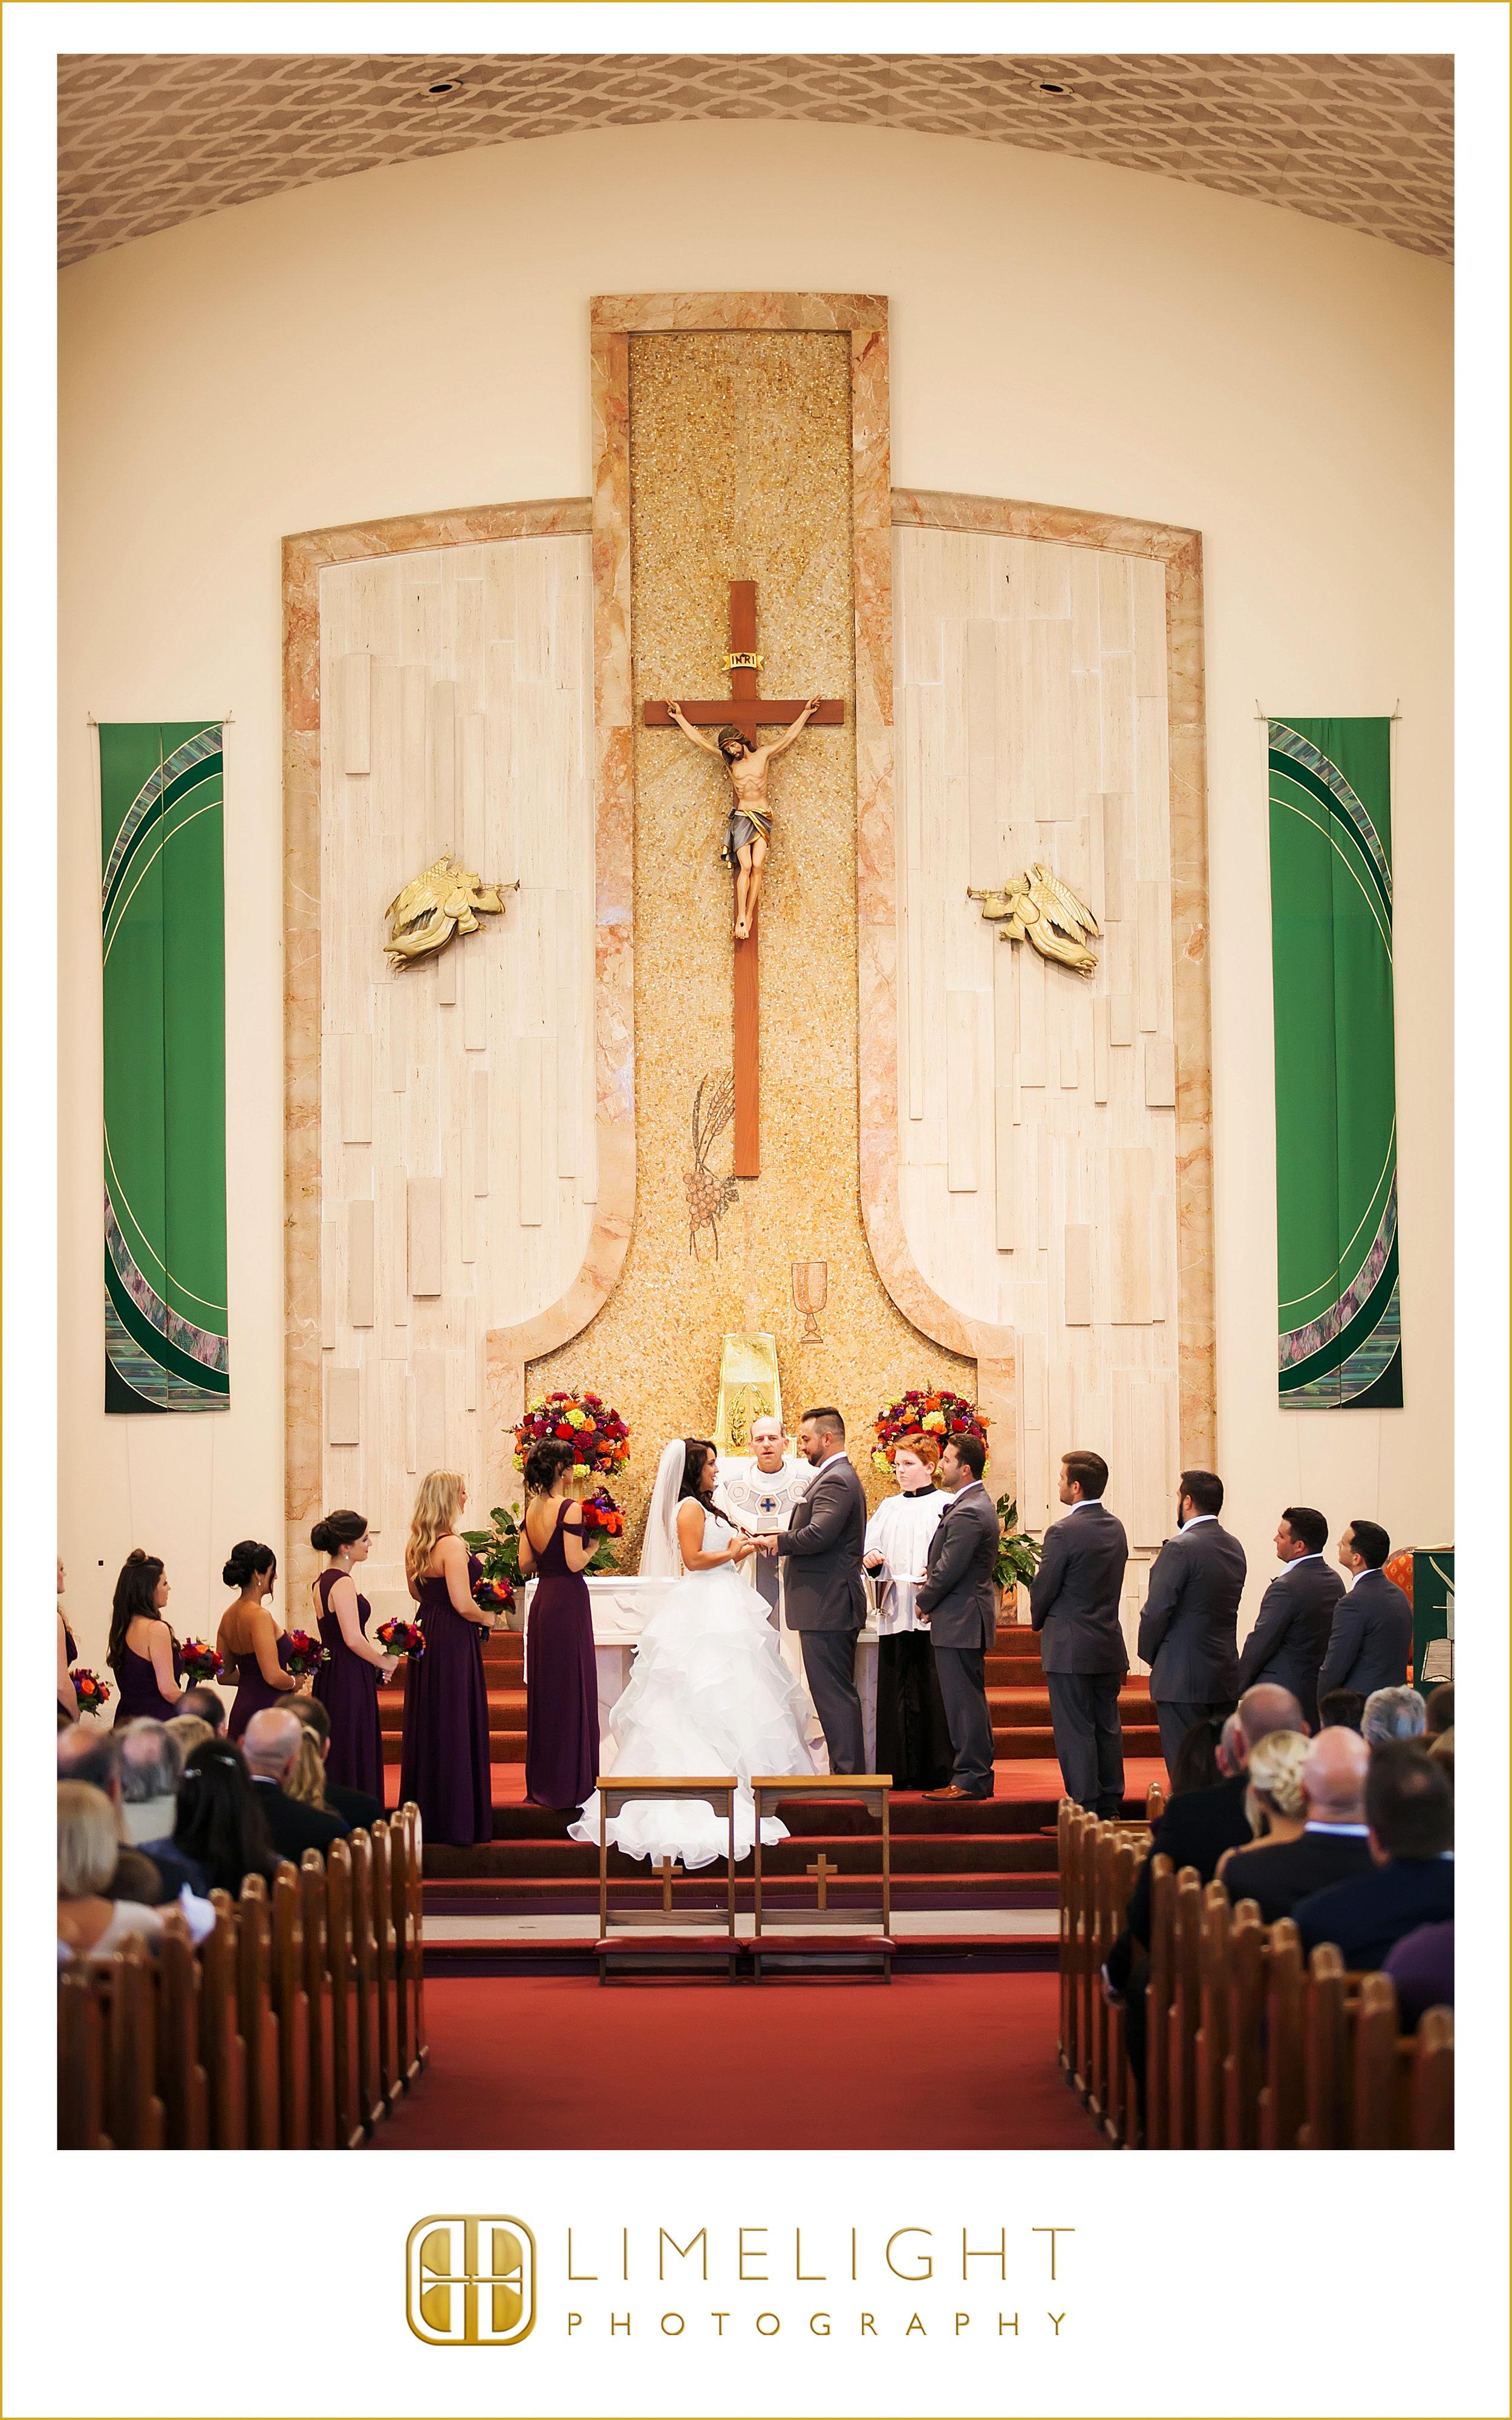 Bride & Groom | Ceremony | Wedding